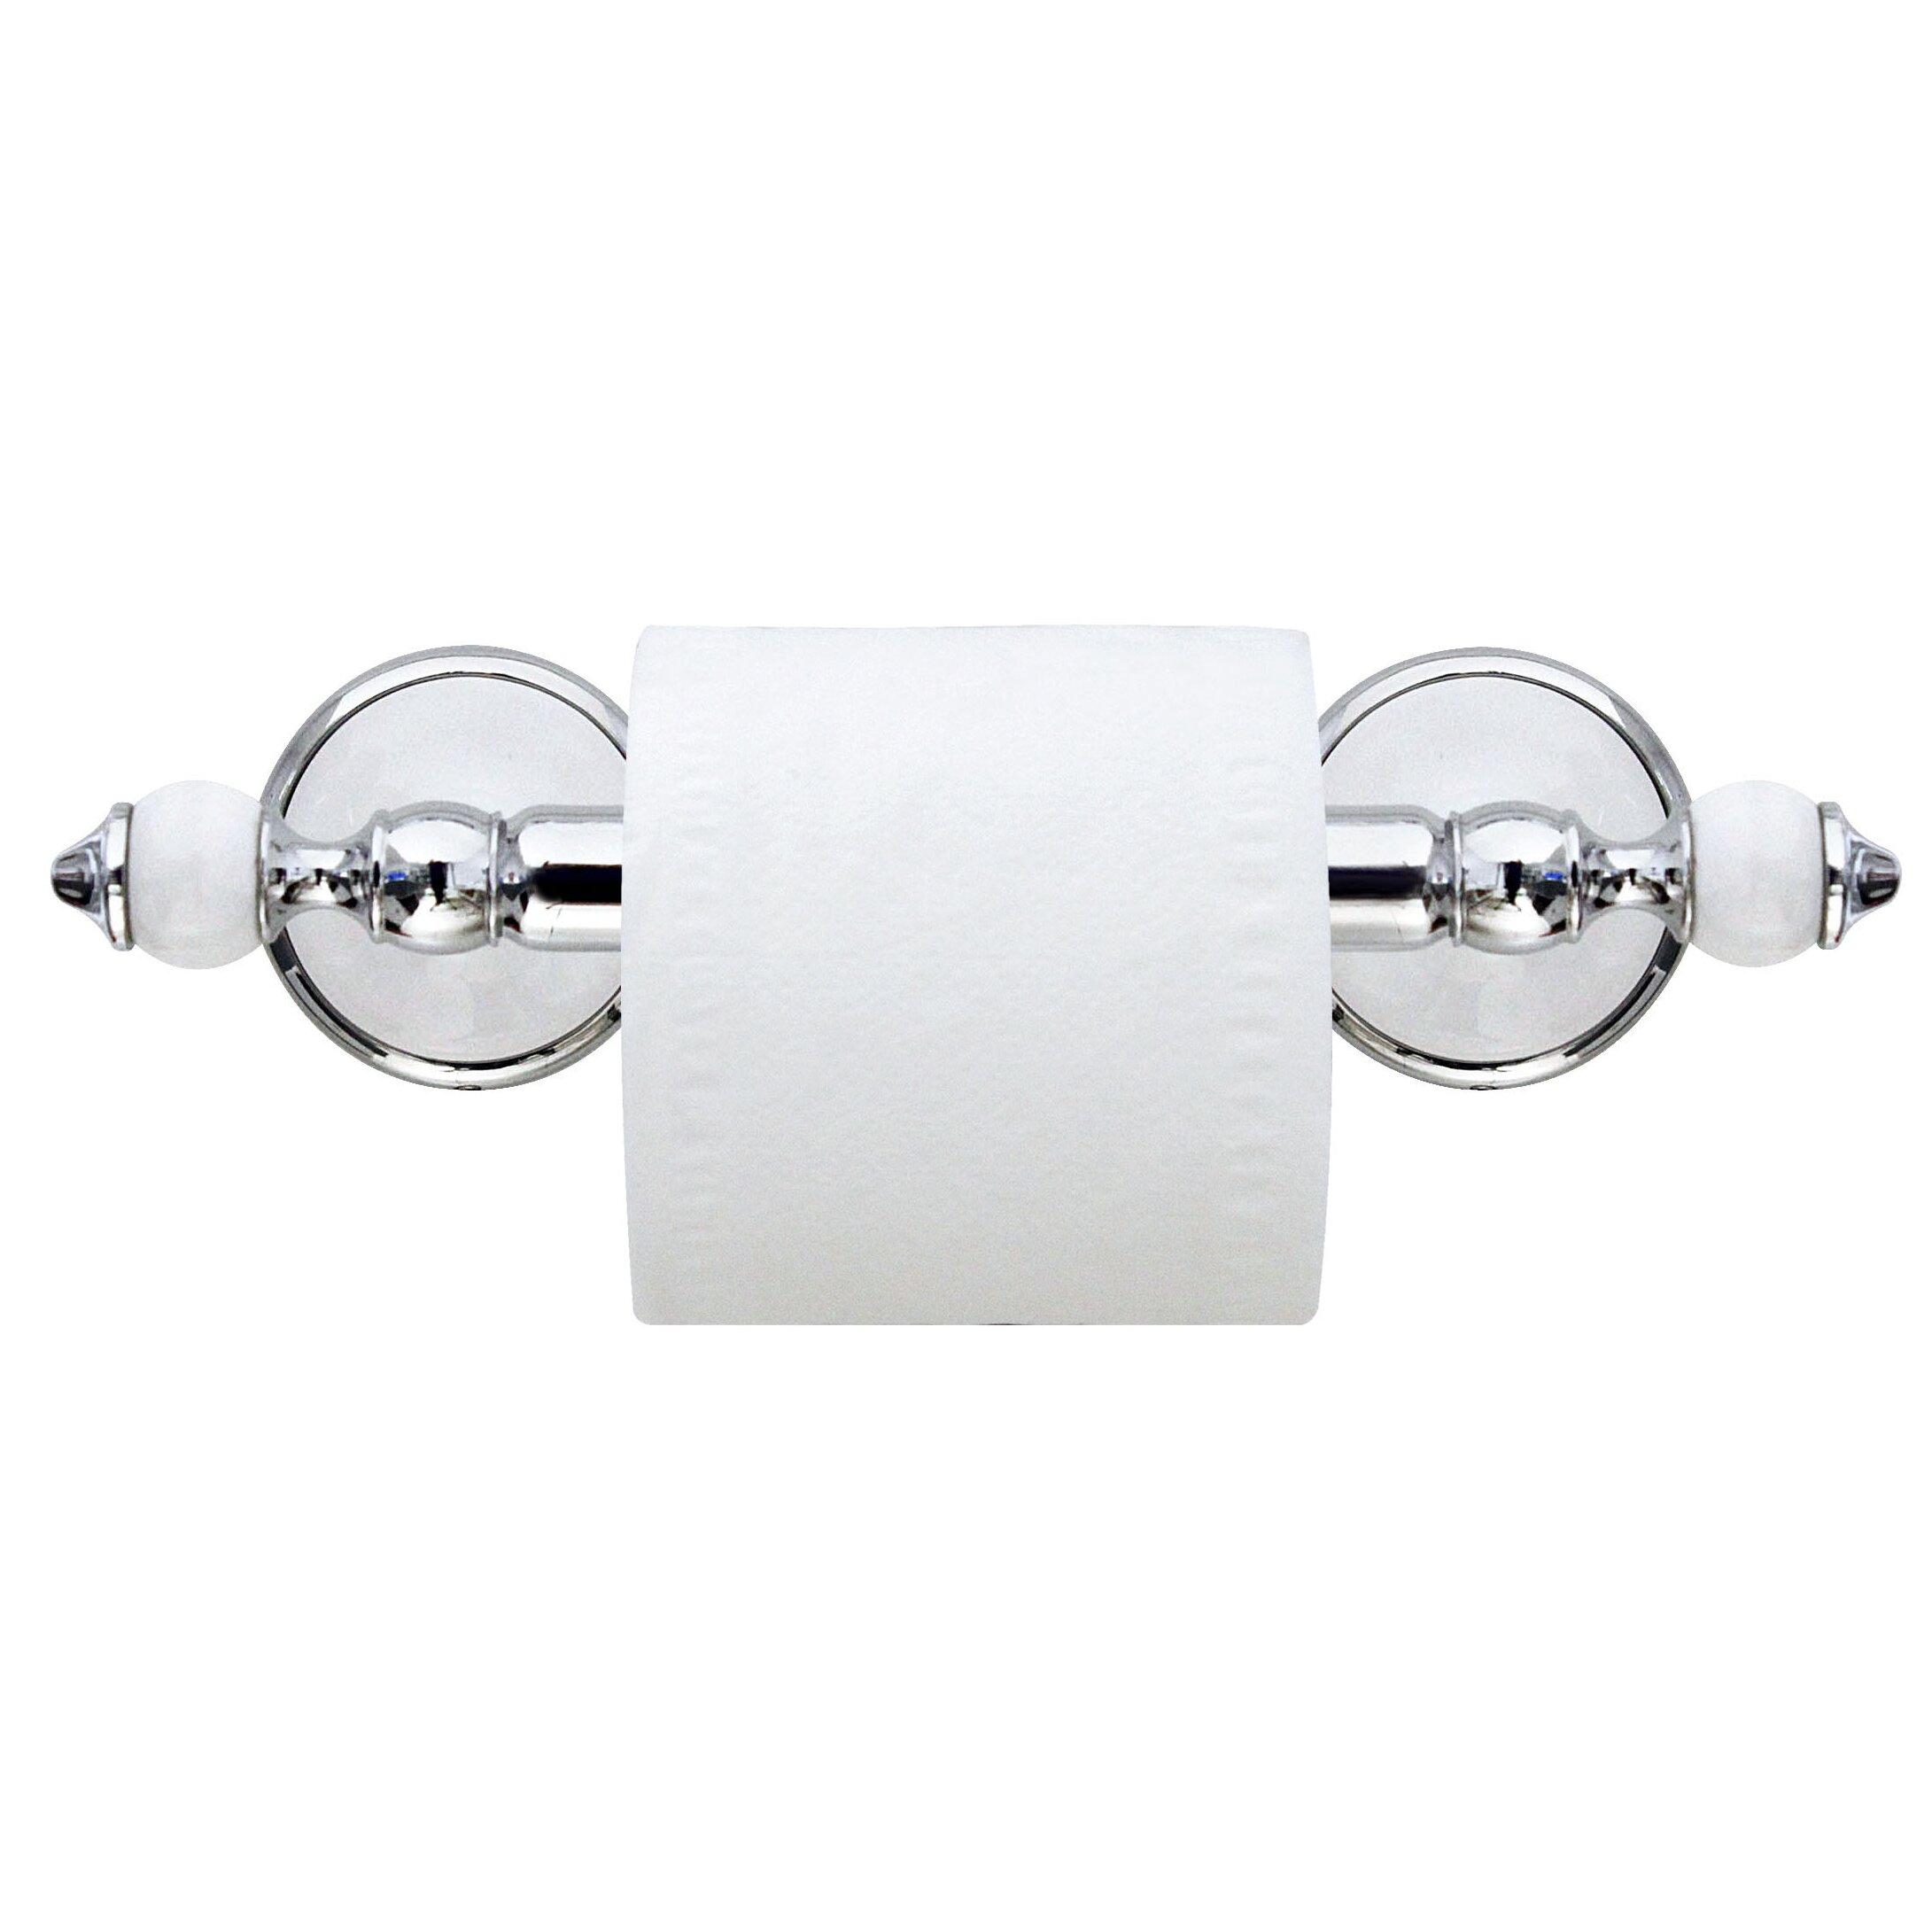 modona arora wall mounted toilet paper holder wayfair. Black Bedroom Furniture Sets. Home Design Ideas